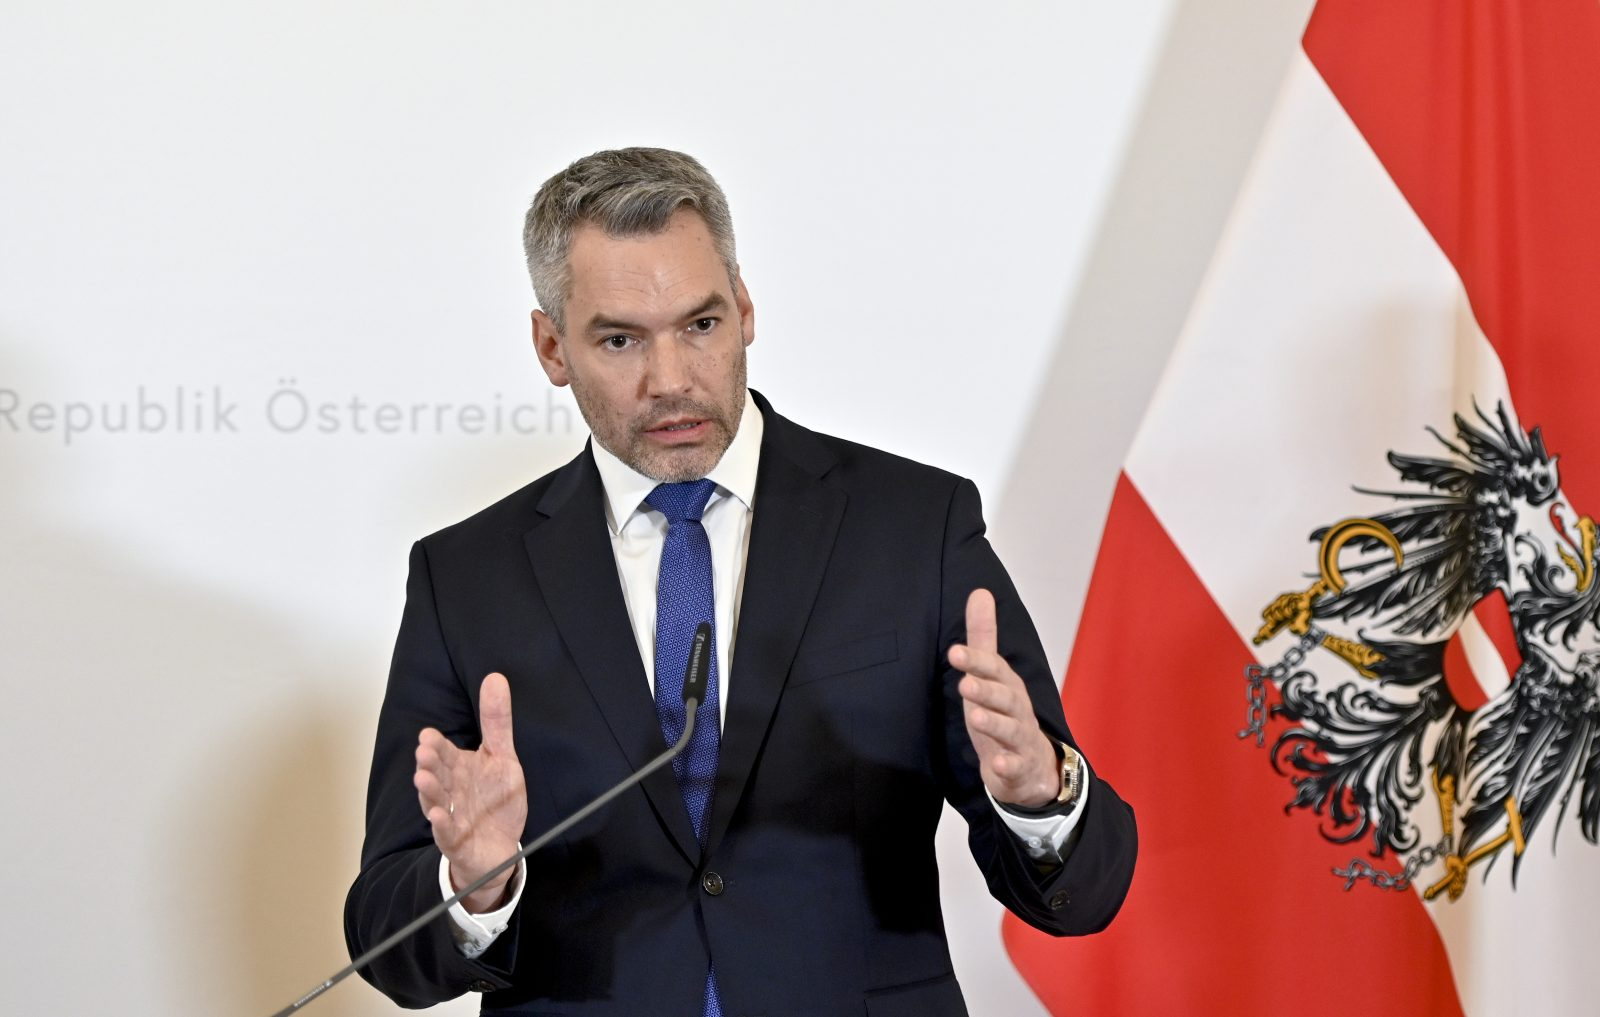 Karl Nehammer (ÖVP)